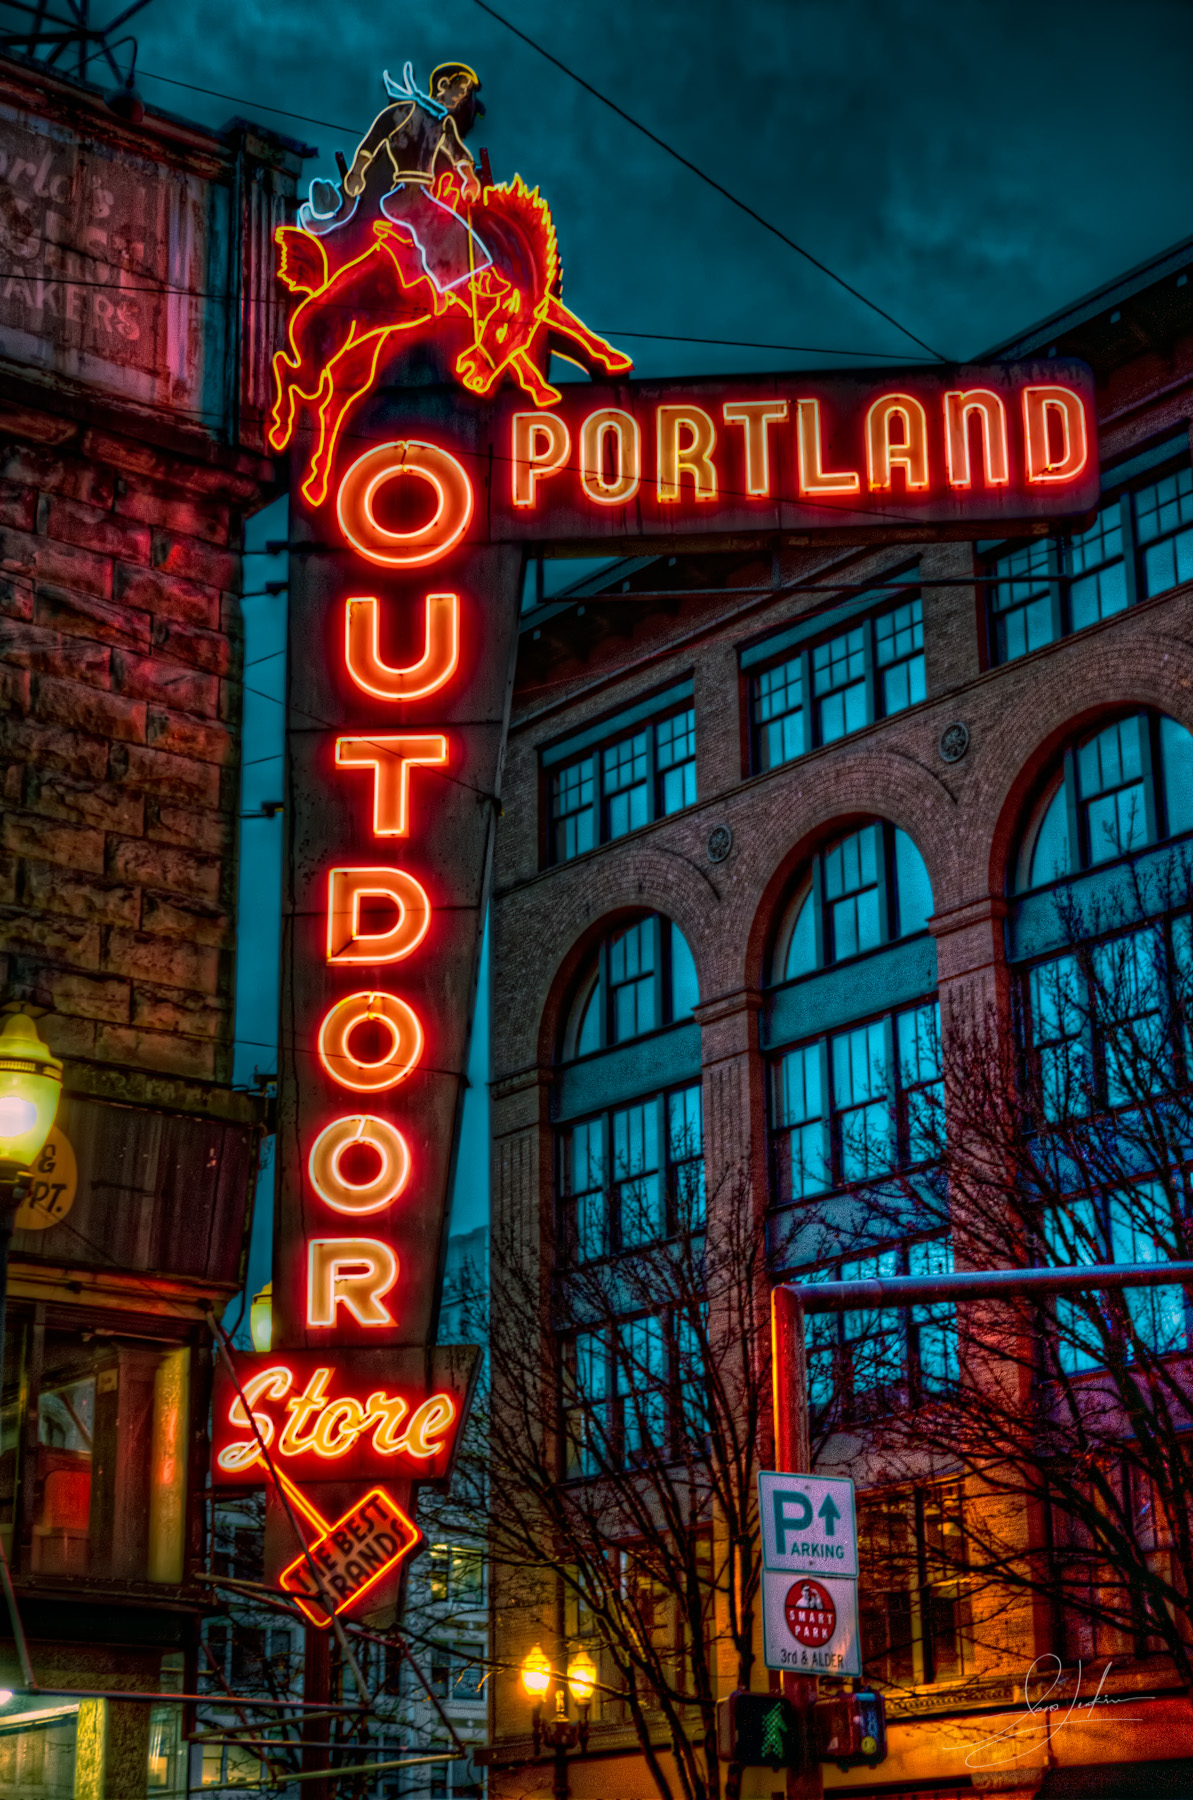 2010-12-26 - Downtown Portland-IMG_0389_90_91